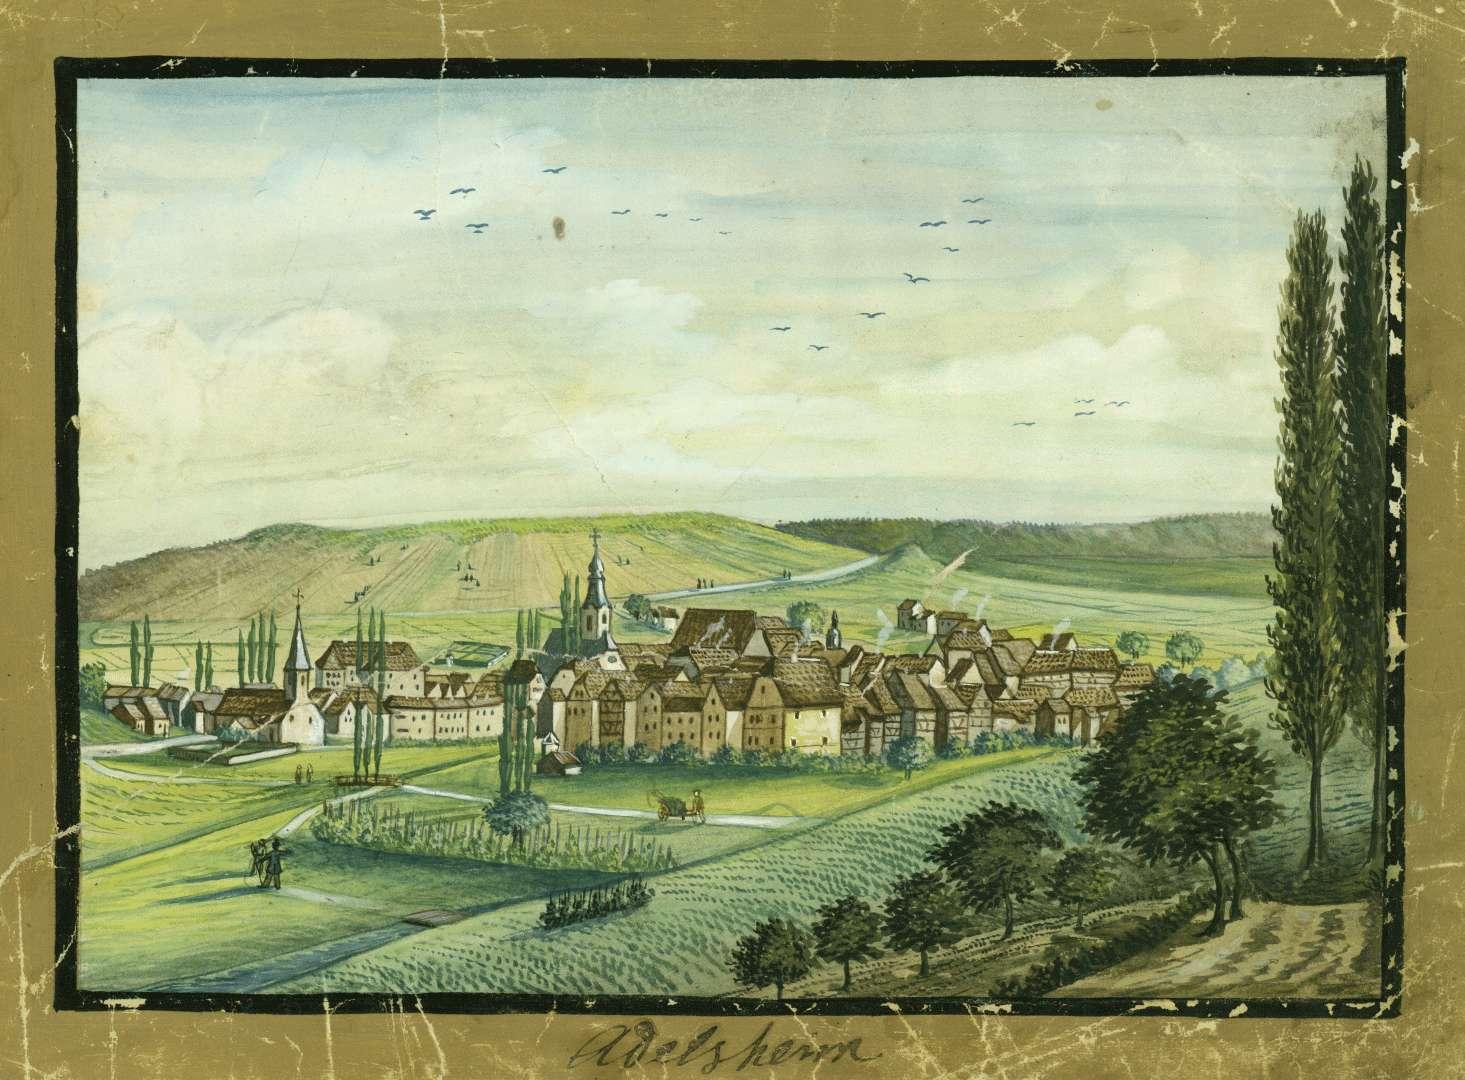 Adelsheim, Bild 1